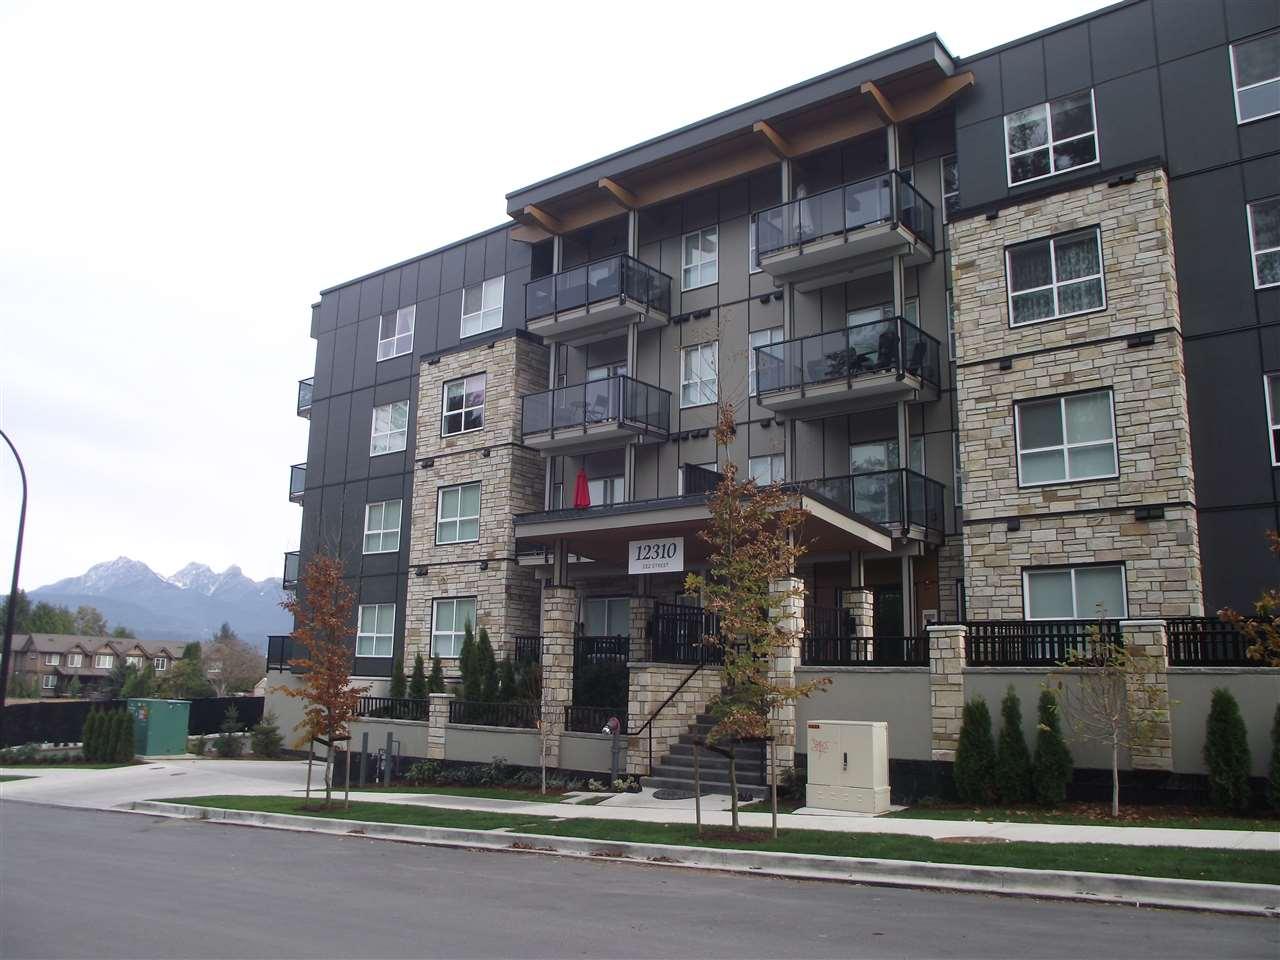 301 12310 222 STREET, Maple Ridge